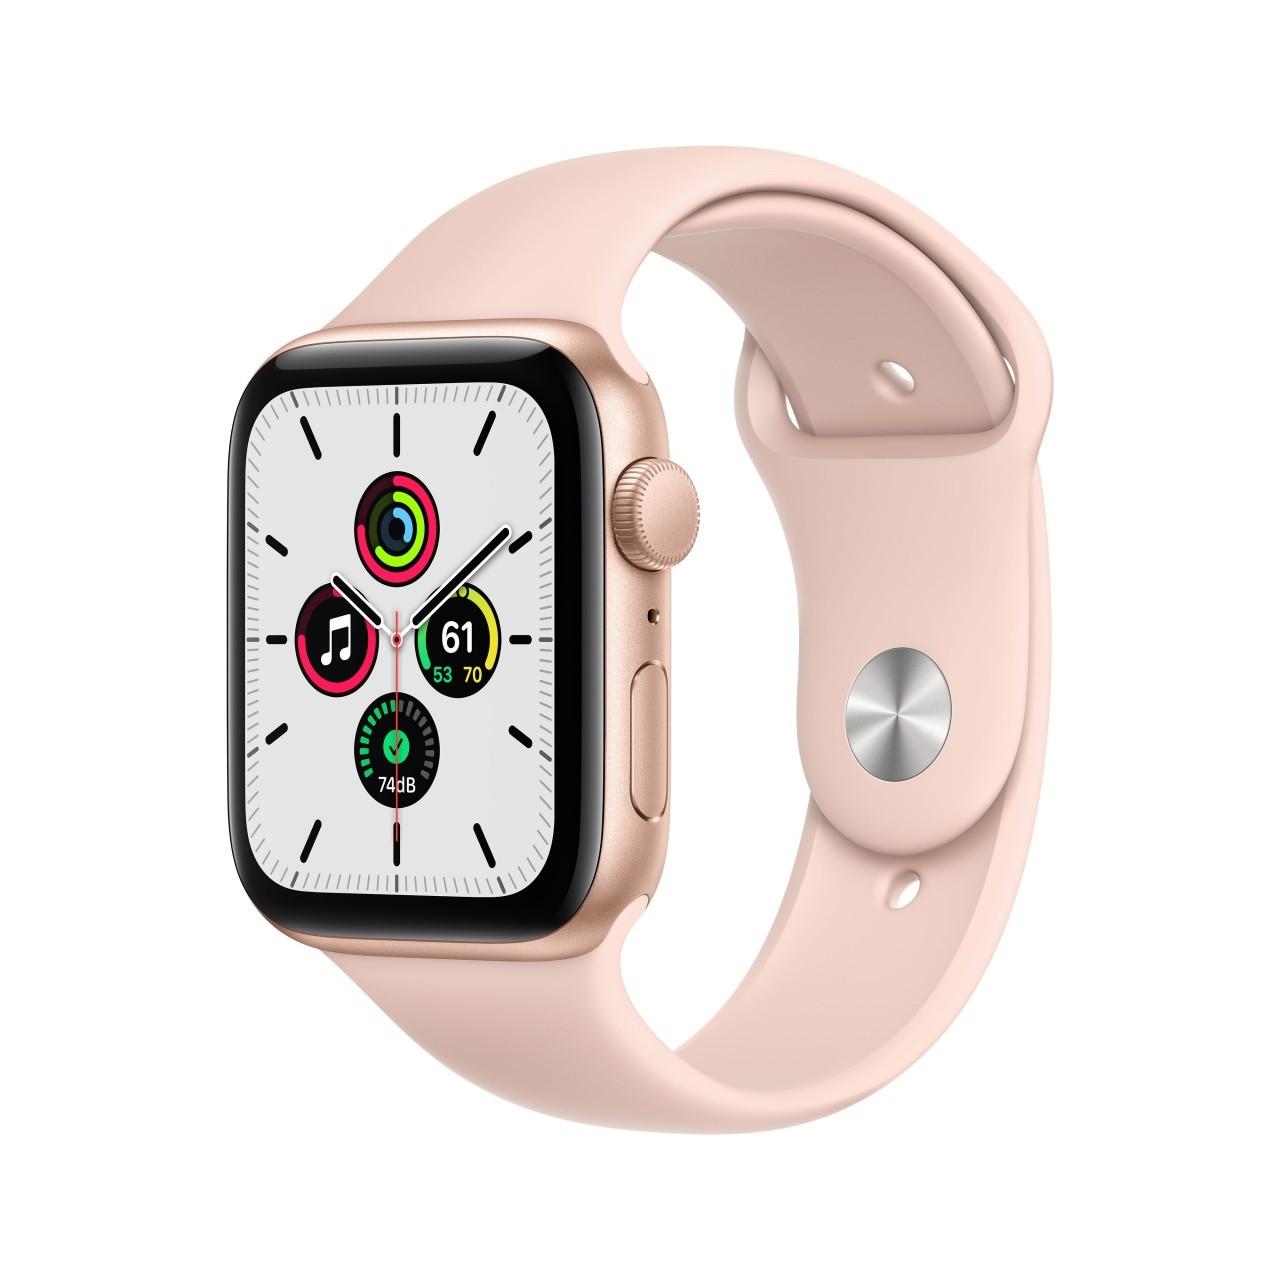 Apple Watch SE OLED Oro GPS (satellitare)